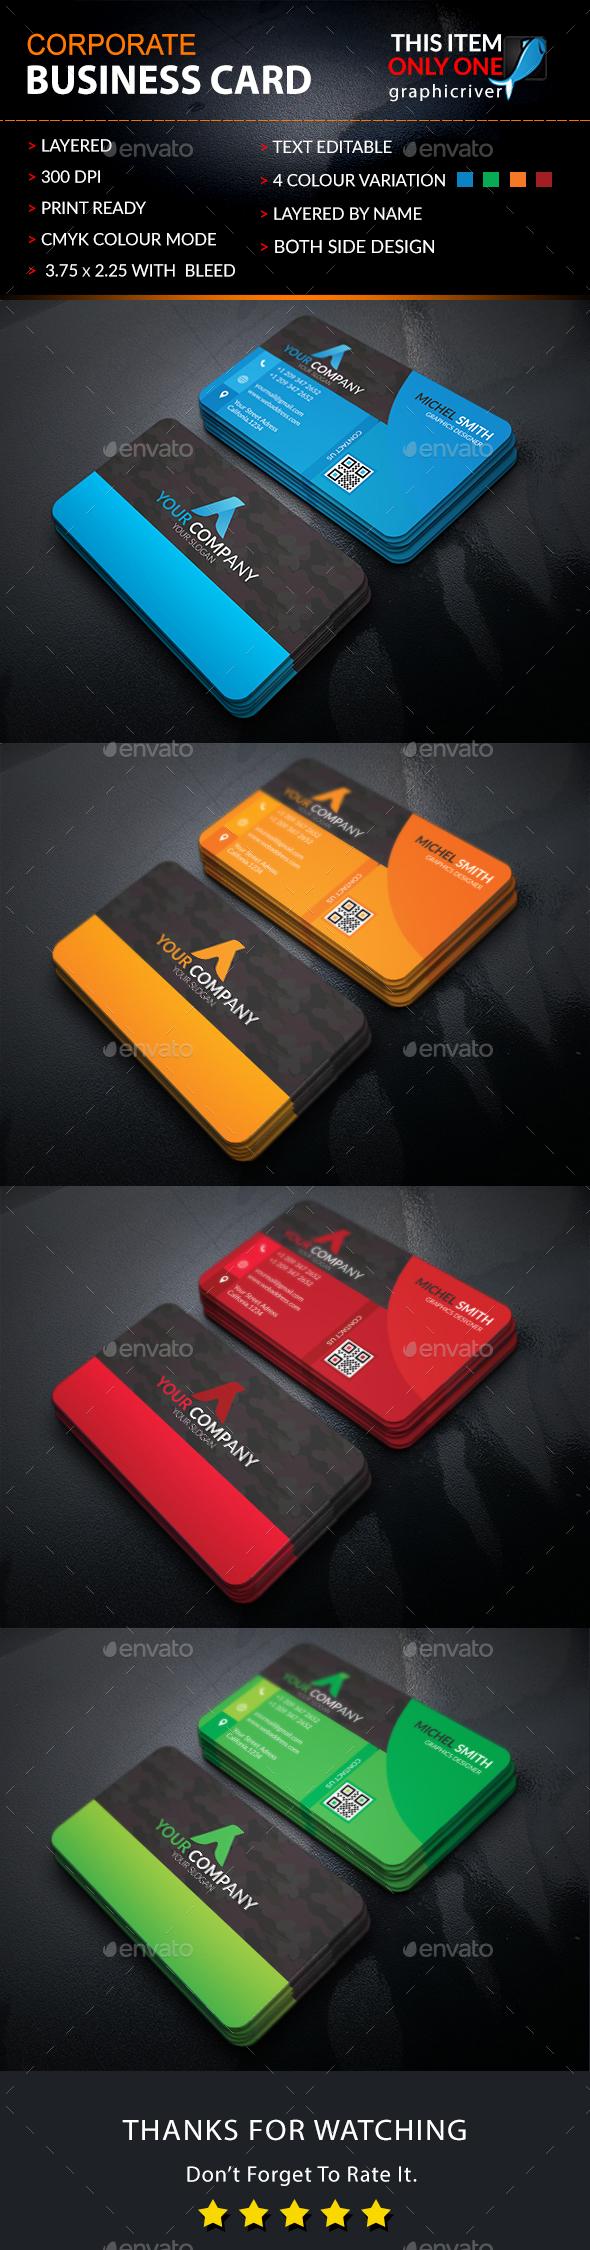 Corporate Business Card v2 - Corporate Business Cards